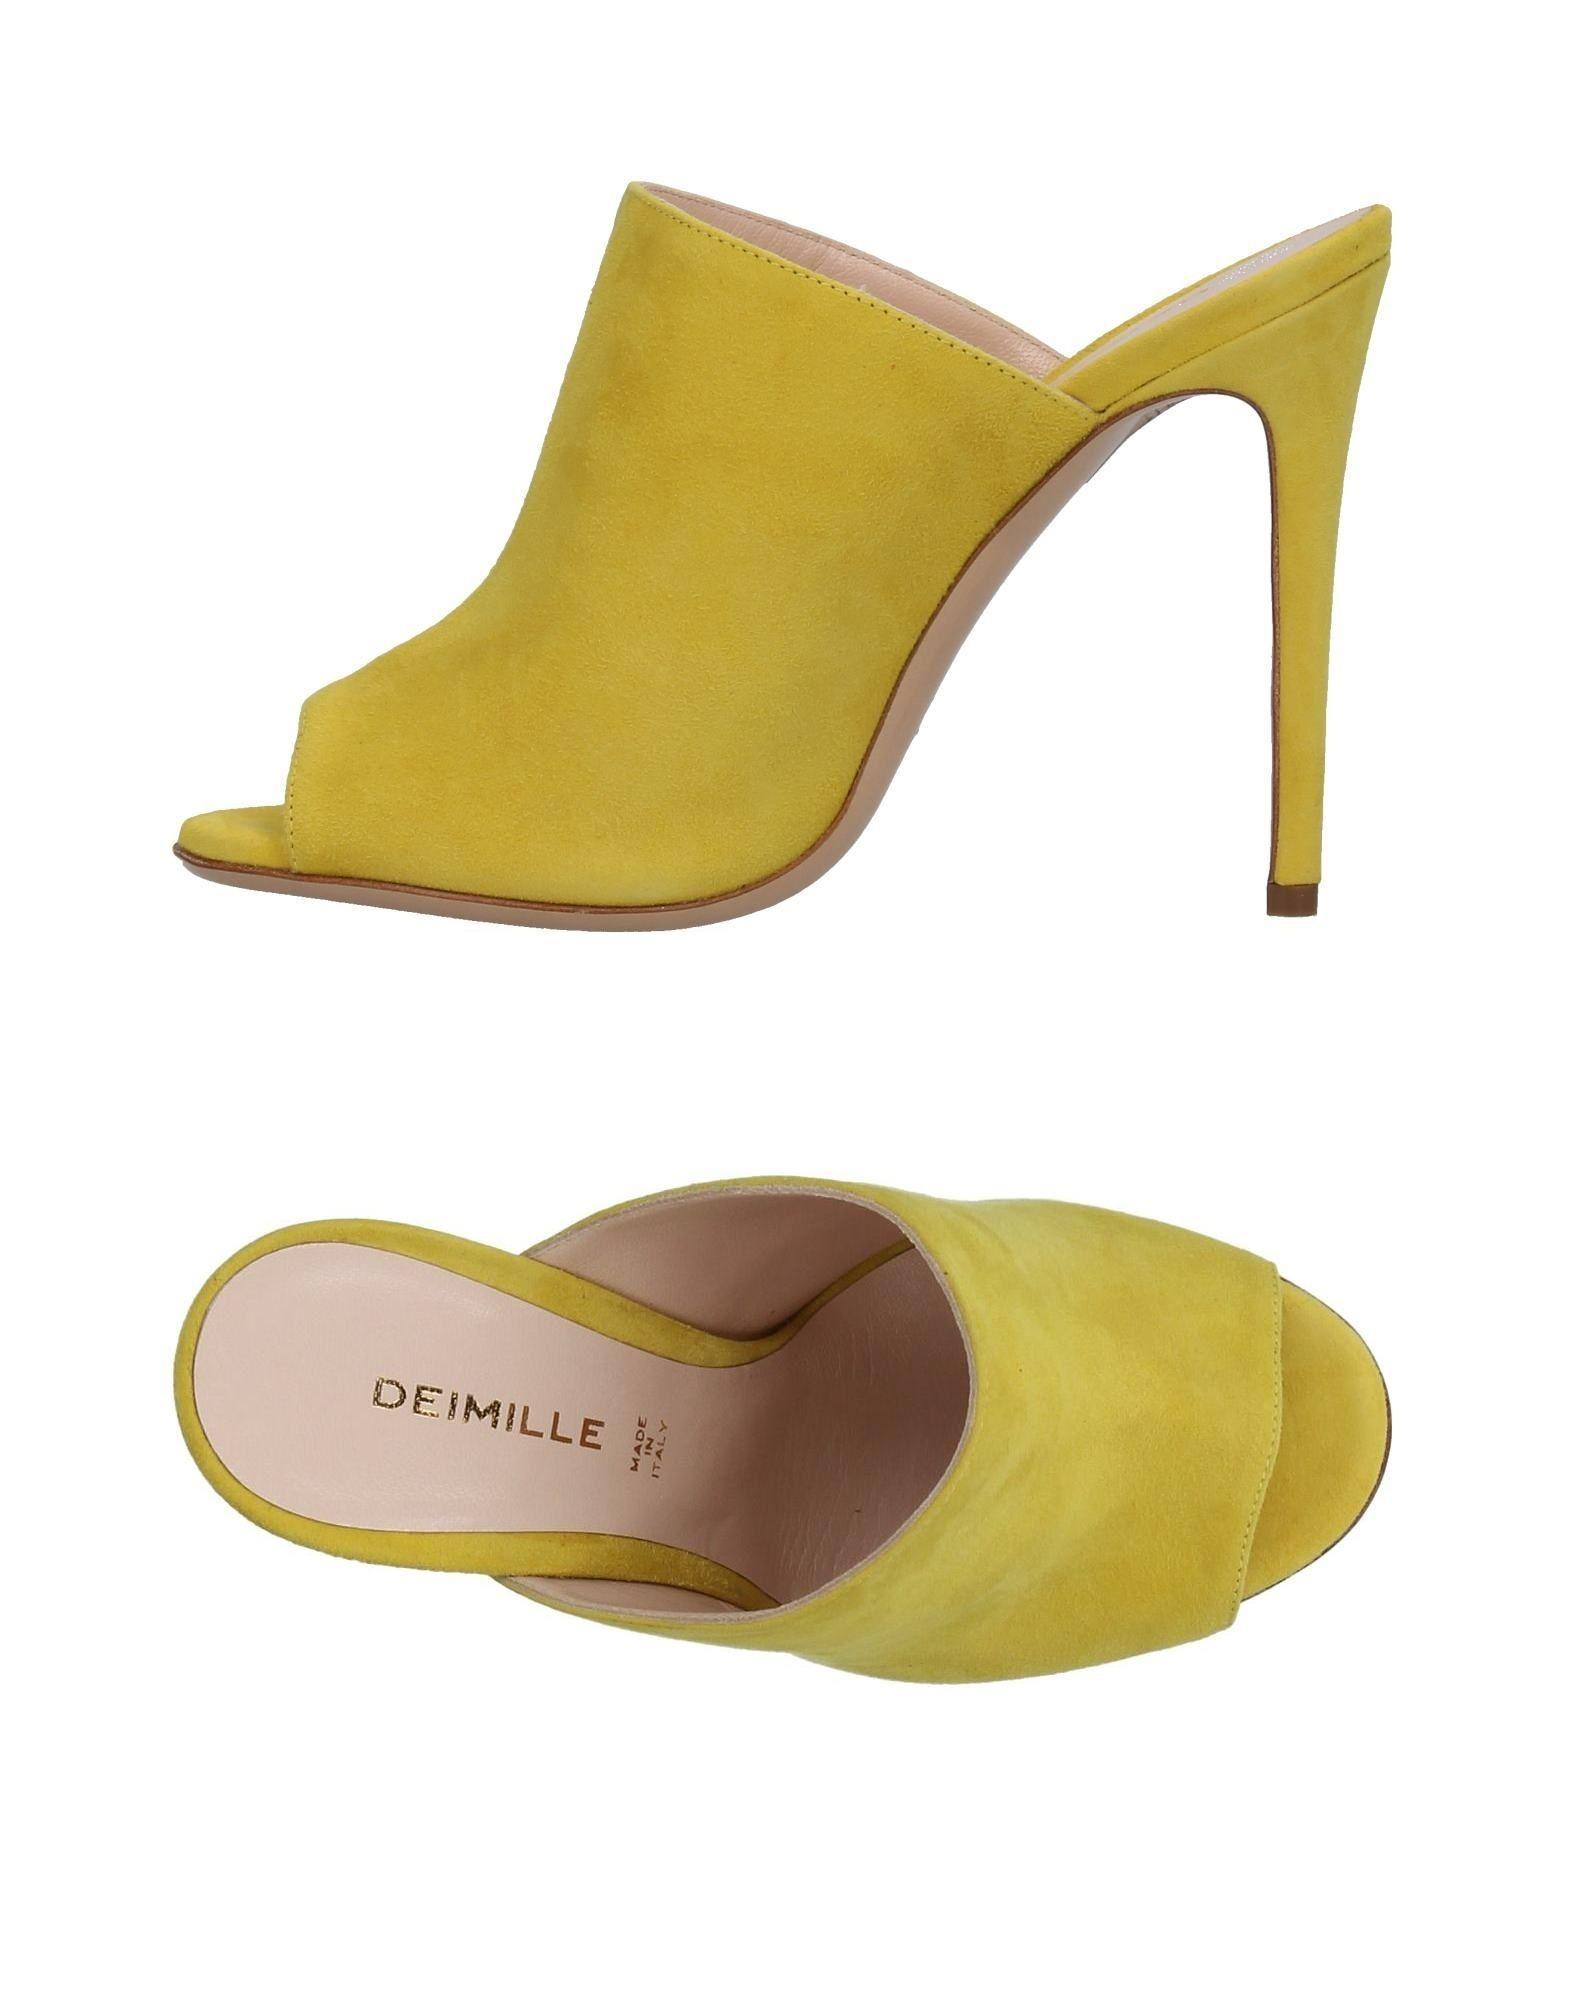 Moda Sandali Deimille Donna - 11358207UJ 11358207UJ - 3b754e